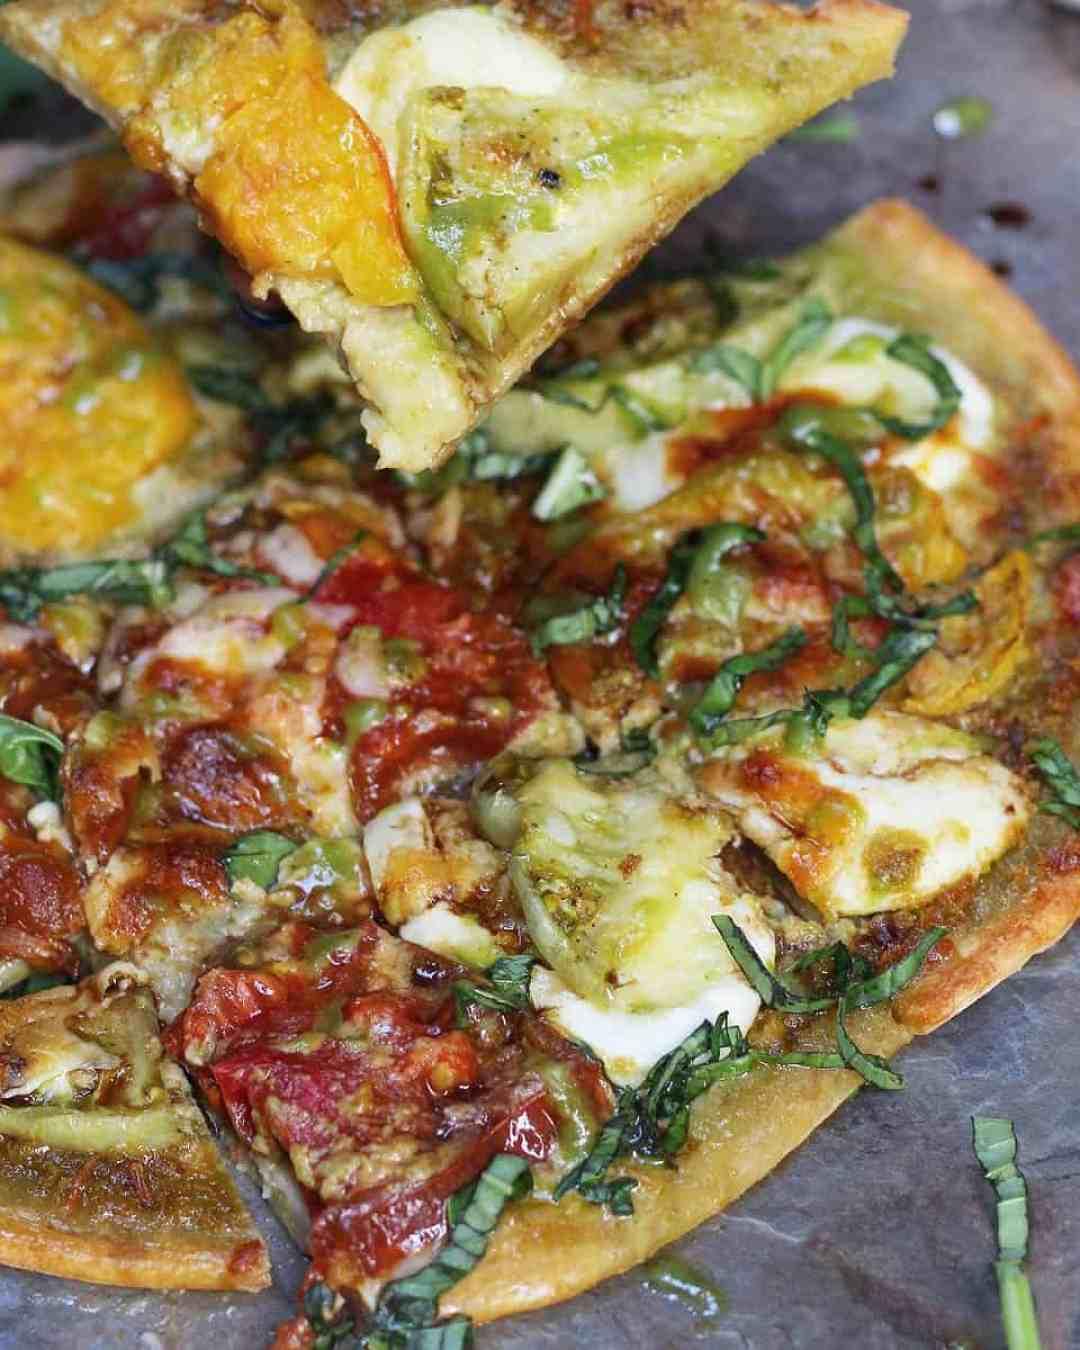 Heirloom Tomato, Mozzarella, and Pesto Flatbread made with Dorot fresh chopped basil and garlic!